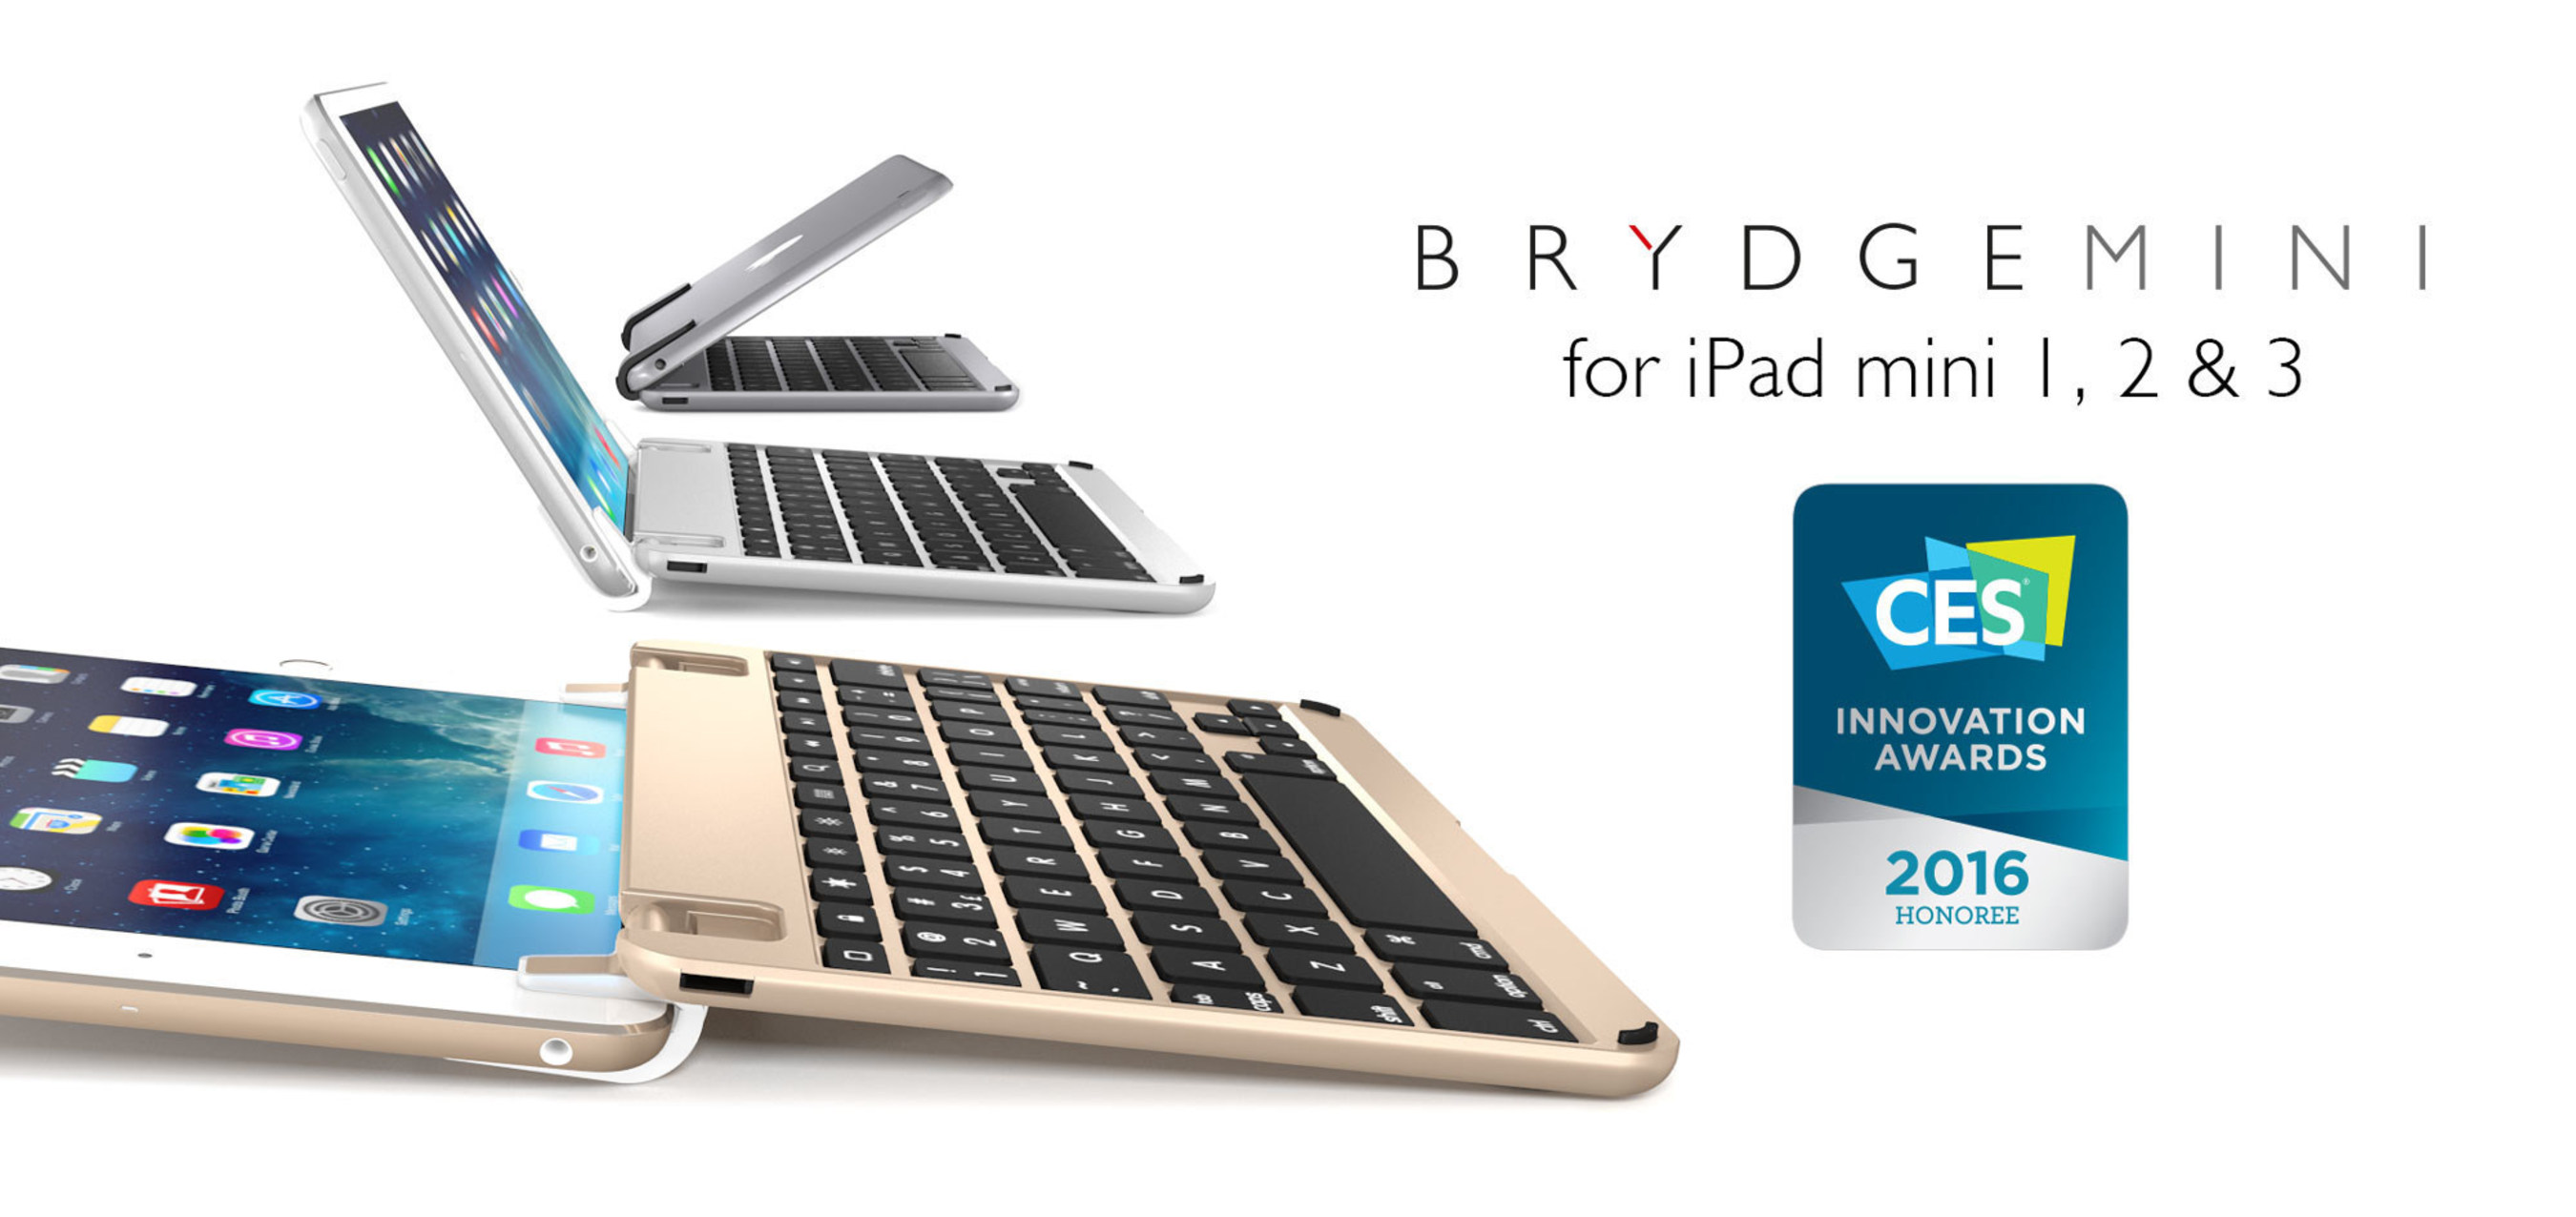 Brydge Debuts the Perfect Companion for the iPad mini: The BrydgeMini